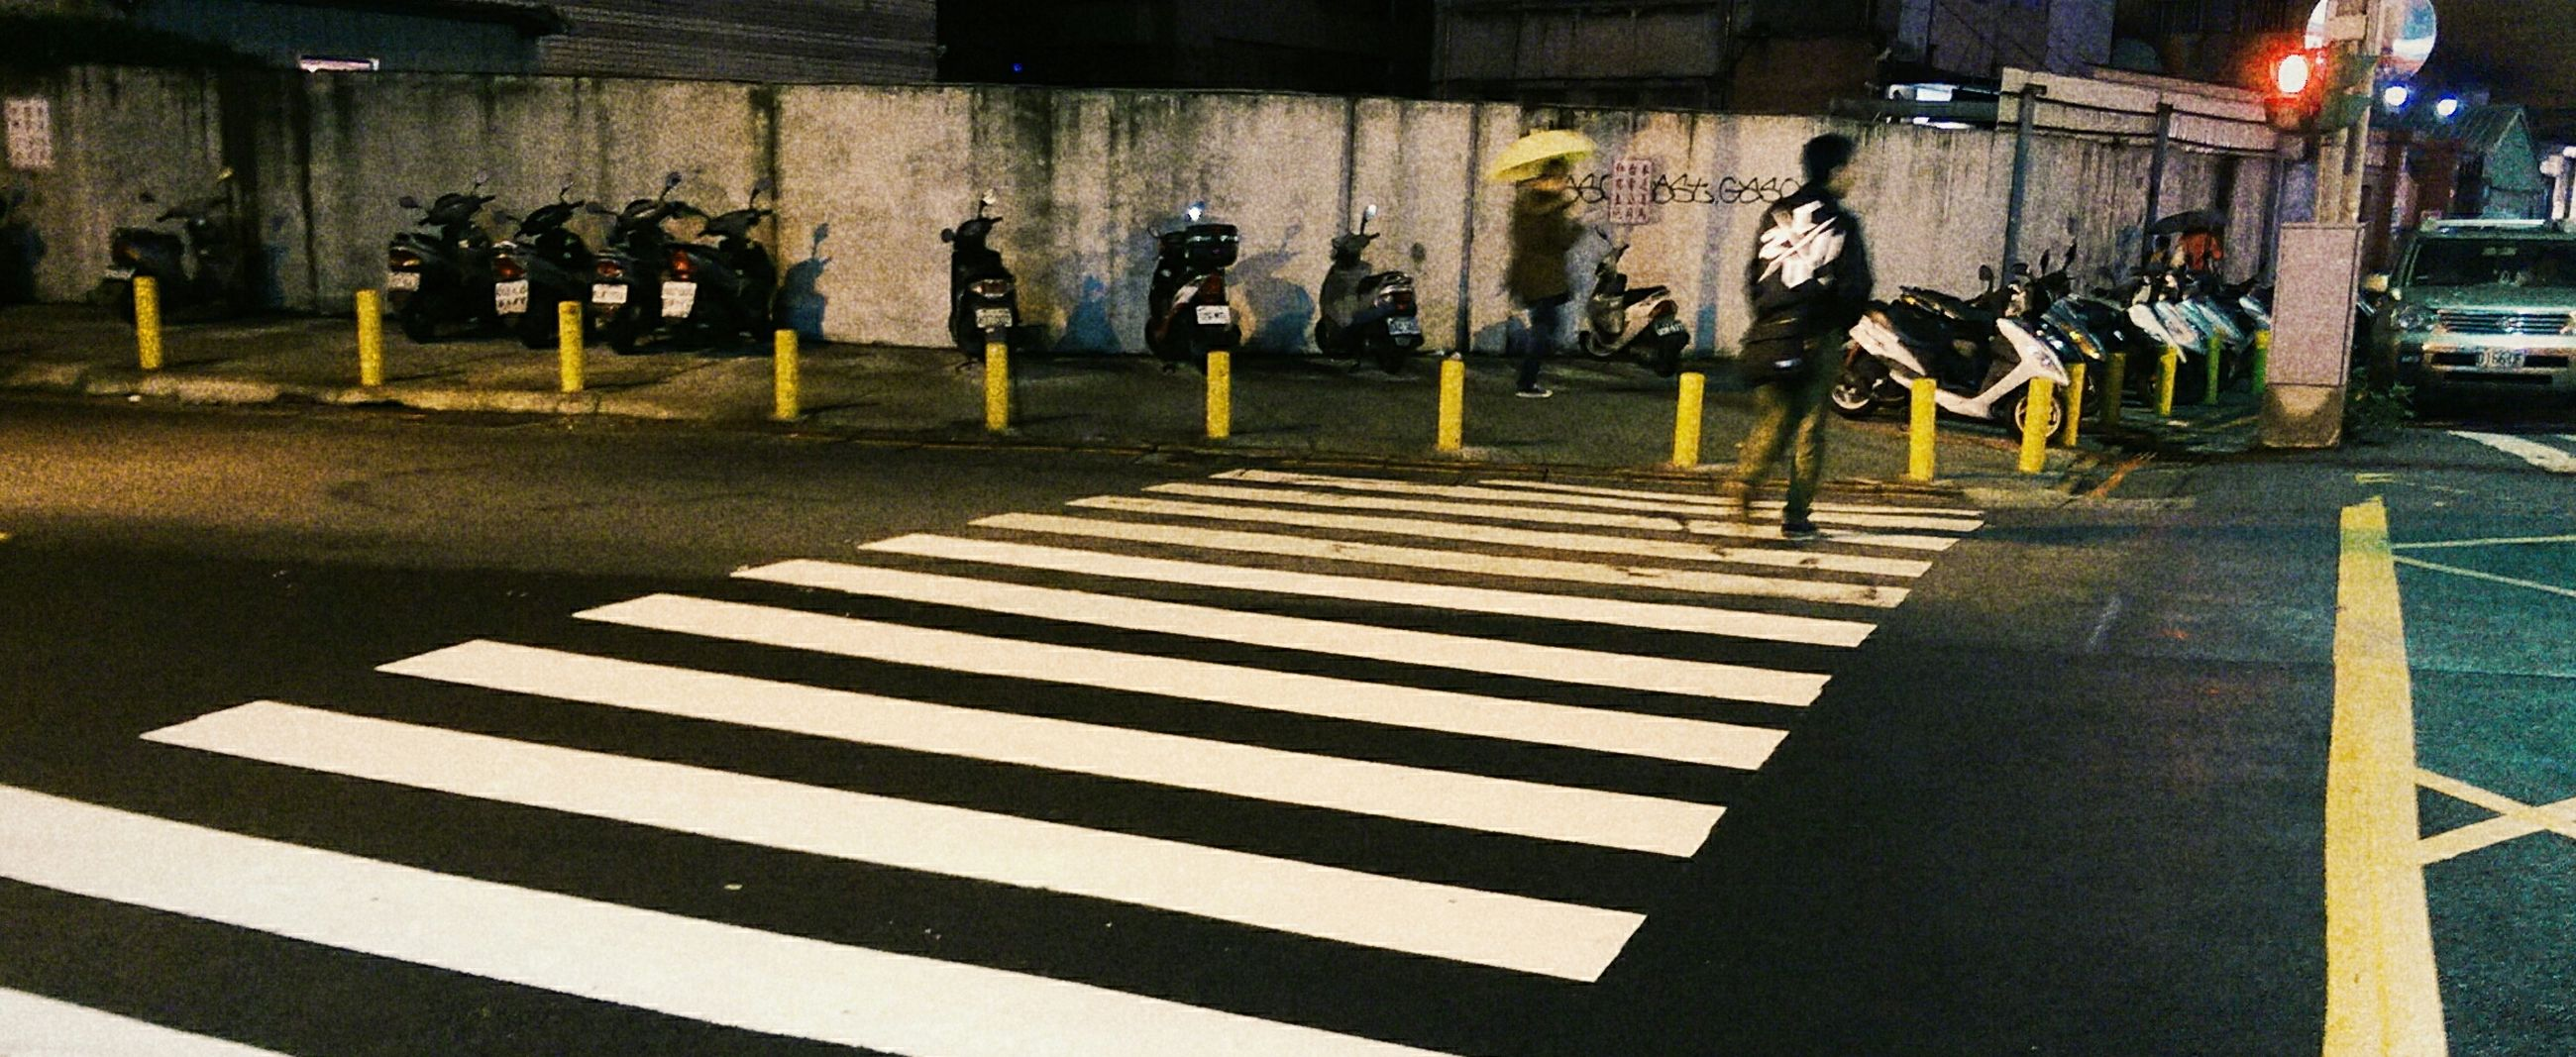 street, road marking, transportation, road, night, city street, zebra crossing, city, sidewalk, in a row, the way forward, incidental people, illuminated, land vehicle, outdoors, city life, street light, shadow, car, built structure